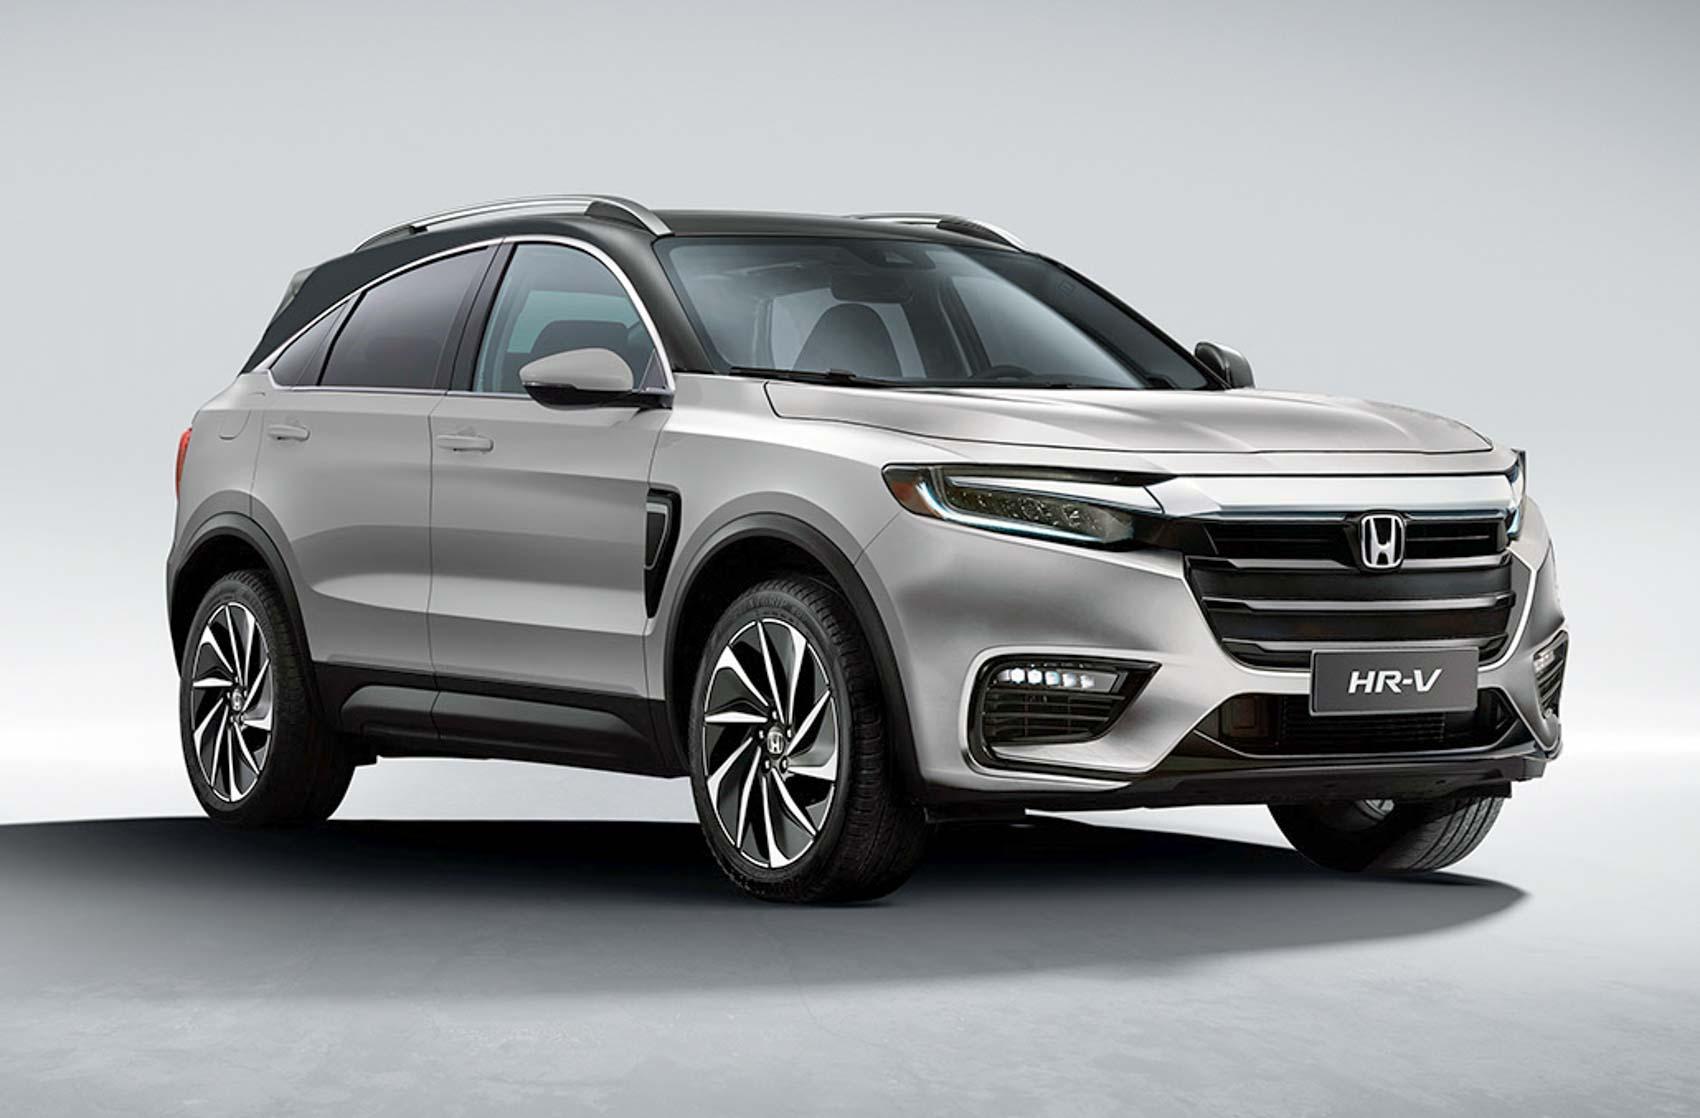 Next-Gen (2020) Honda HR-V Rendered As Hyundai Creta Rival SUV